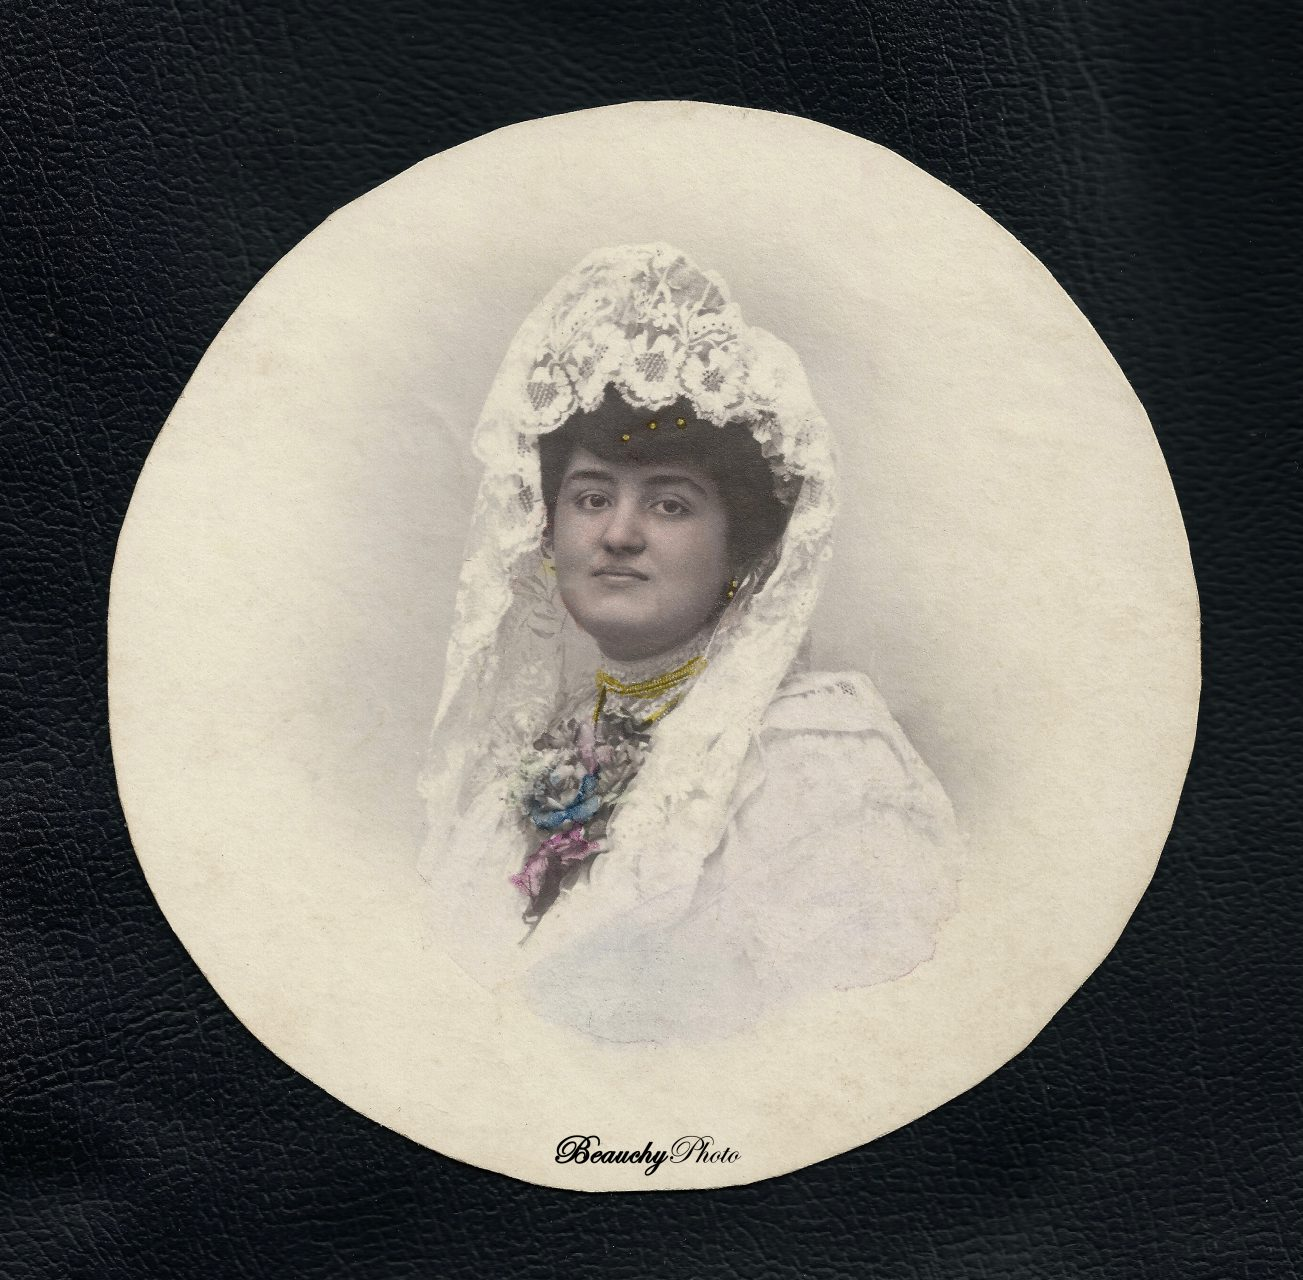 Matilde Adame Beauchy